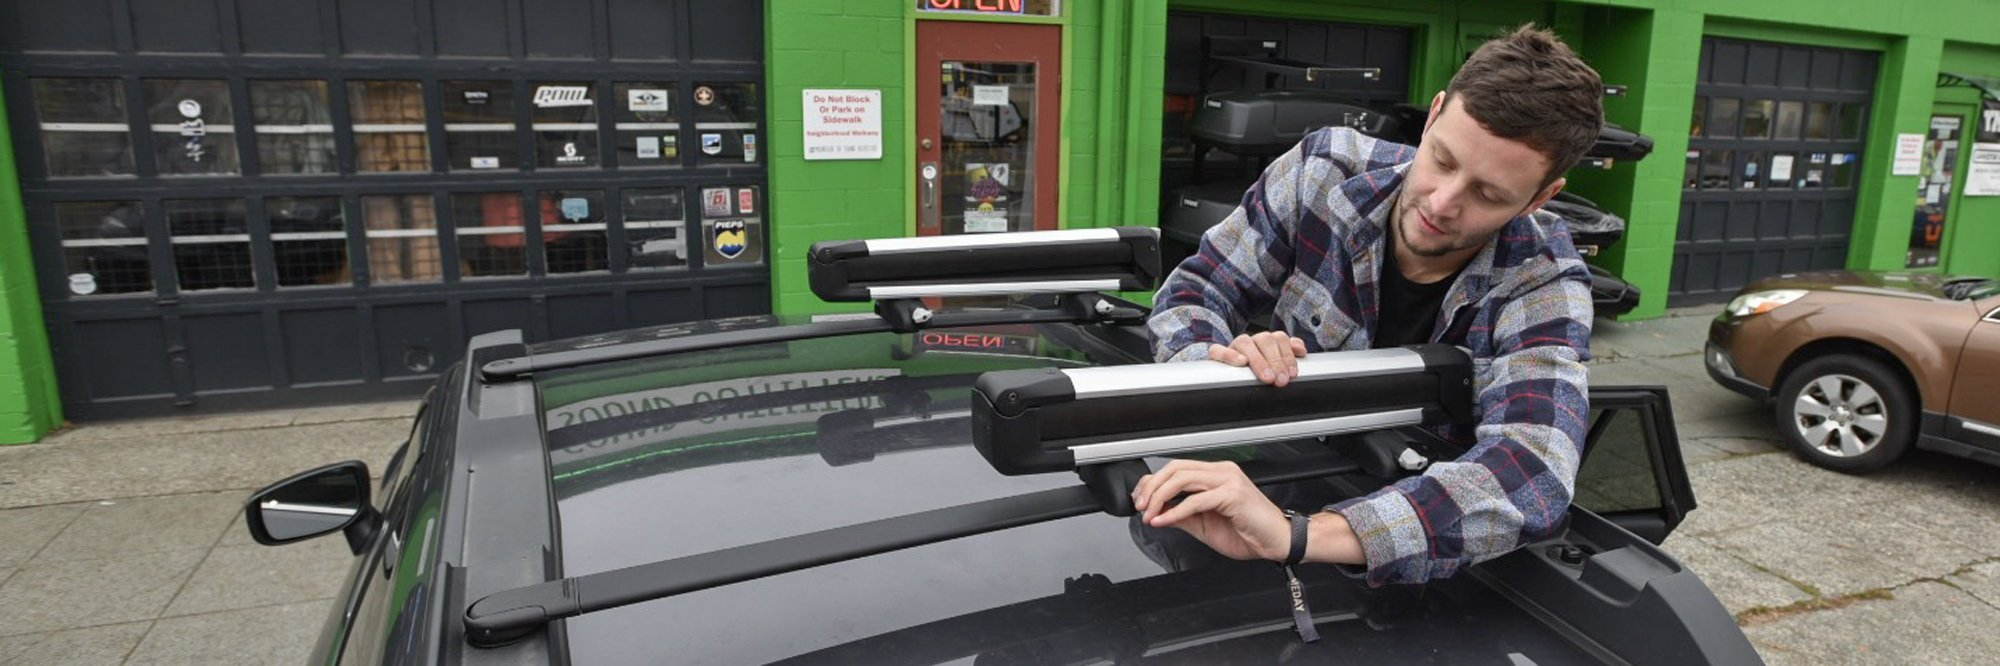 car rack systems for kayaks